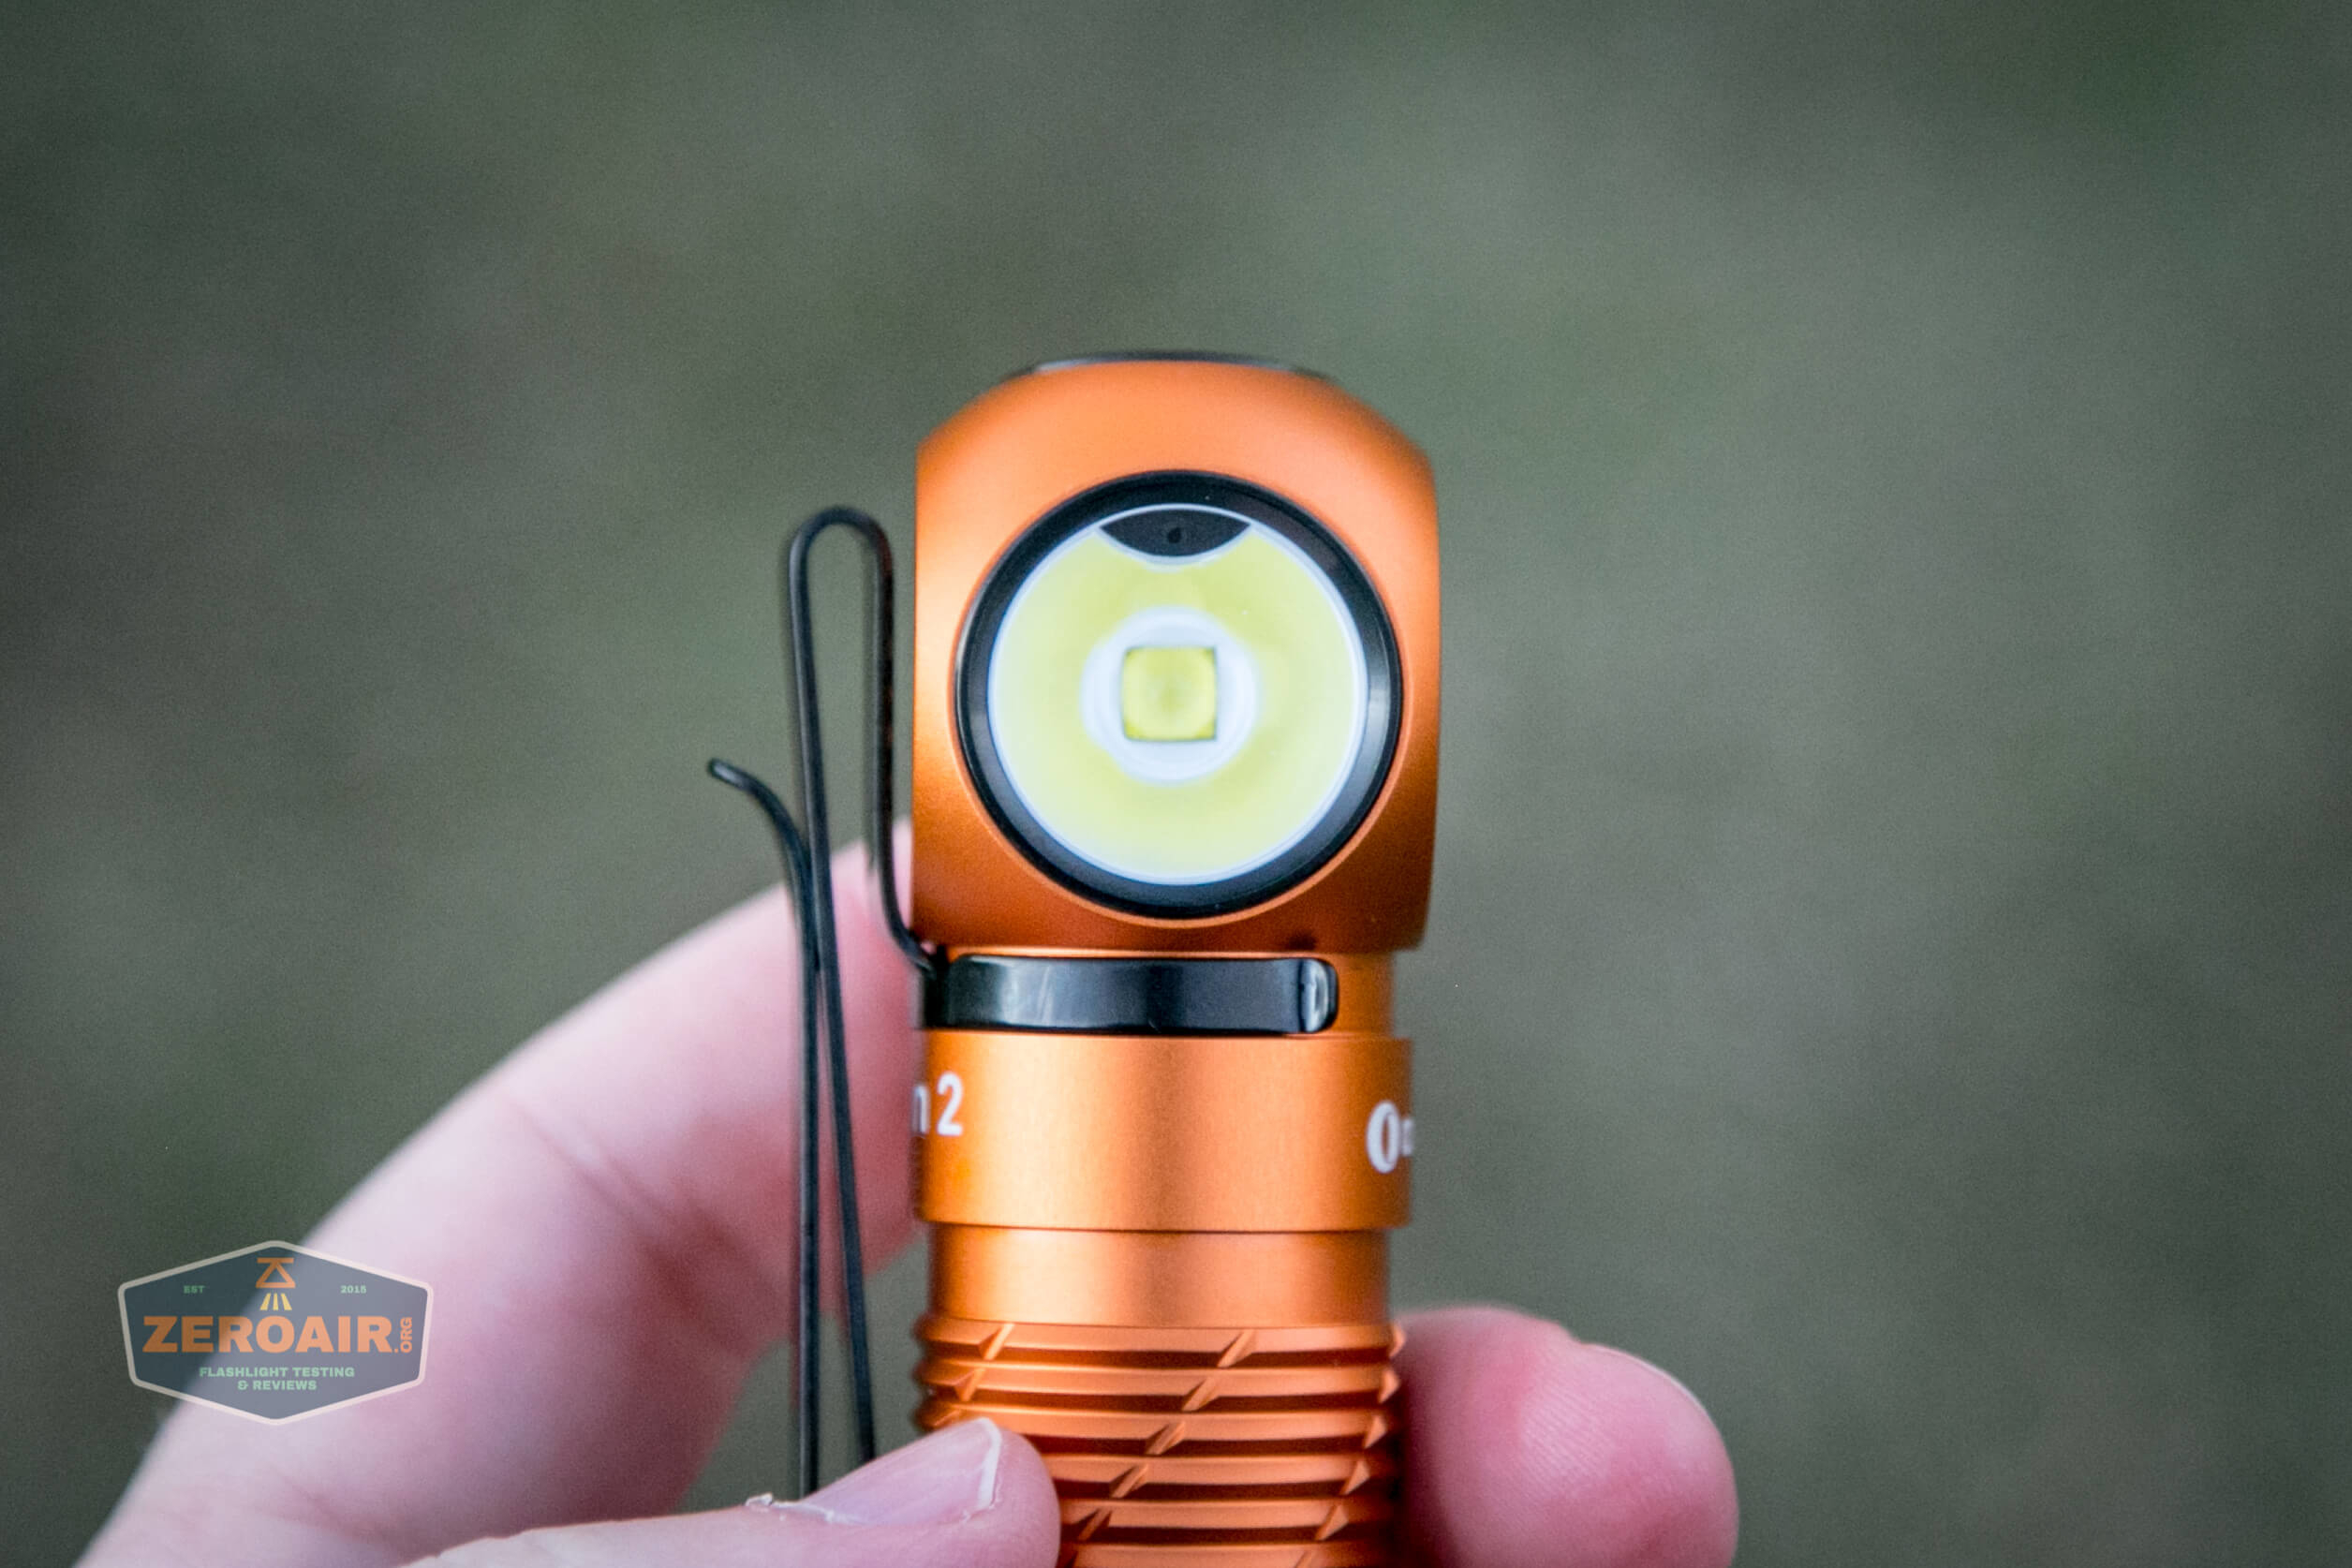 olight perun 2 21700 headlamp orange emitter